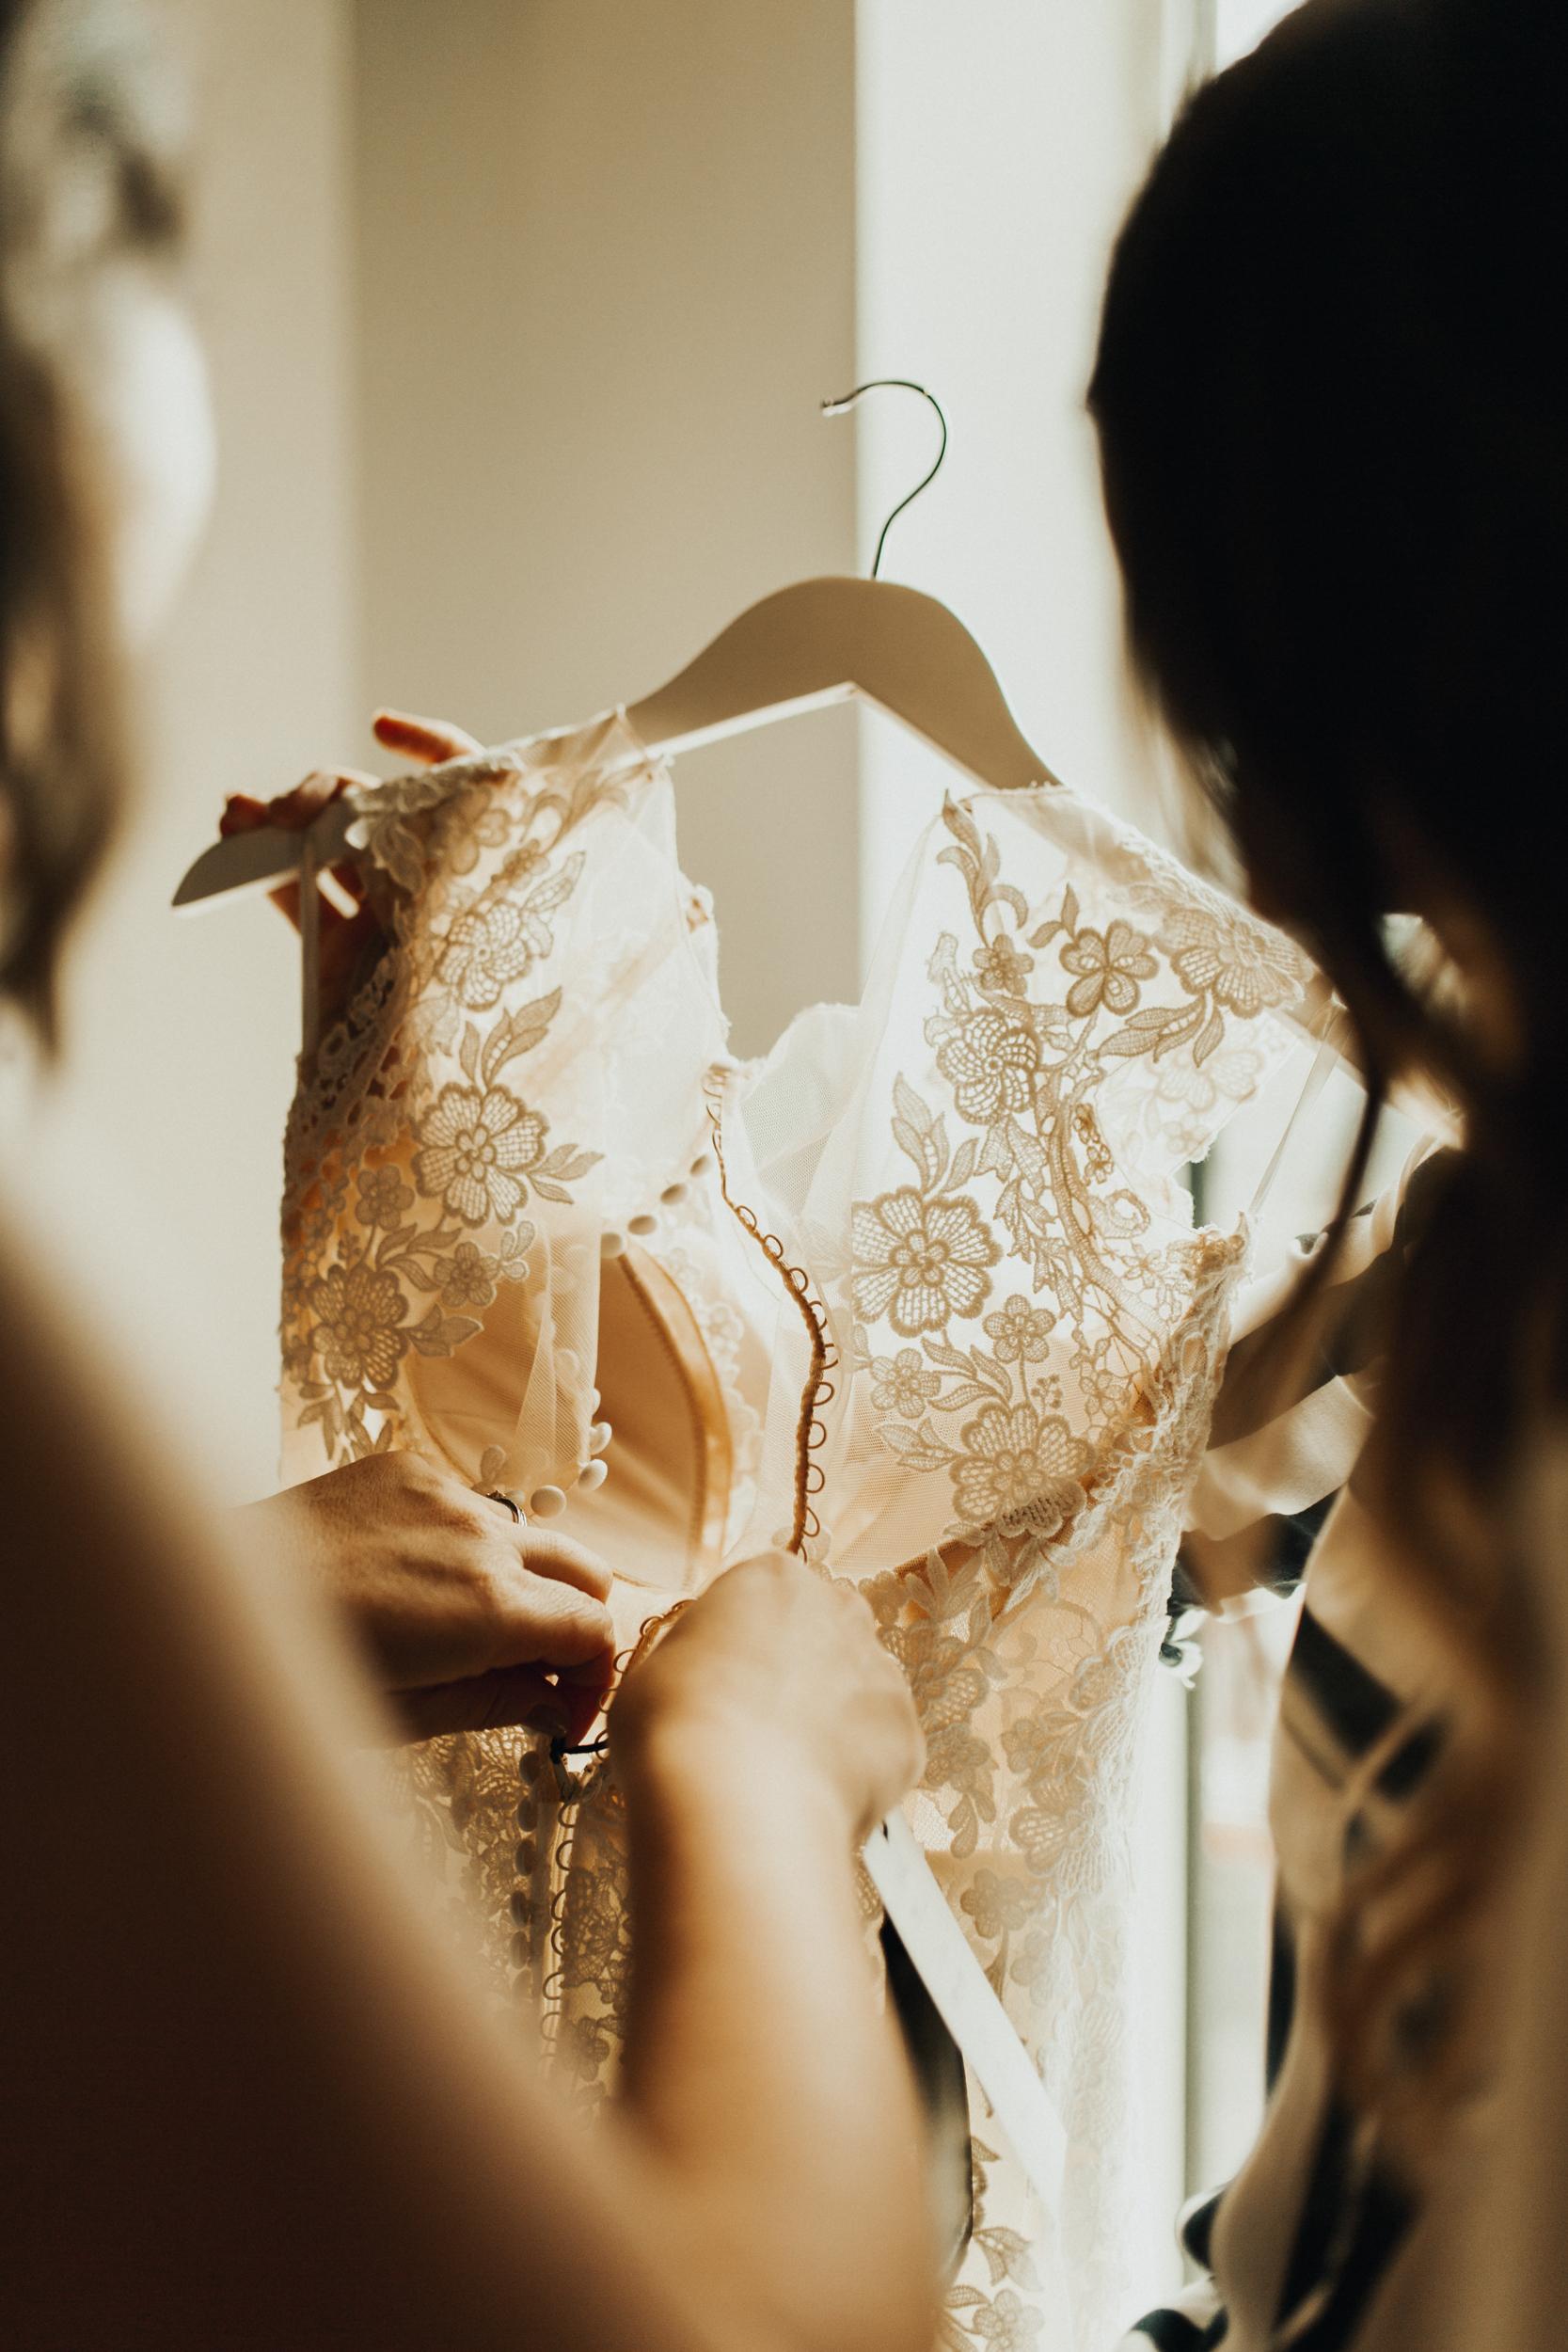 Laura-Benn-The-Asylum-London-The-Ace-Hotel-Wedding-Alternative-Darina-Stoda-Photography-28.jpg